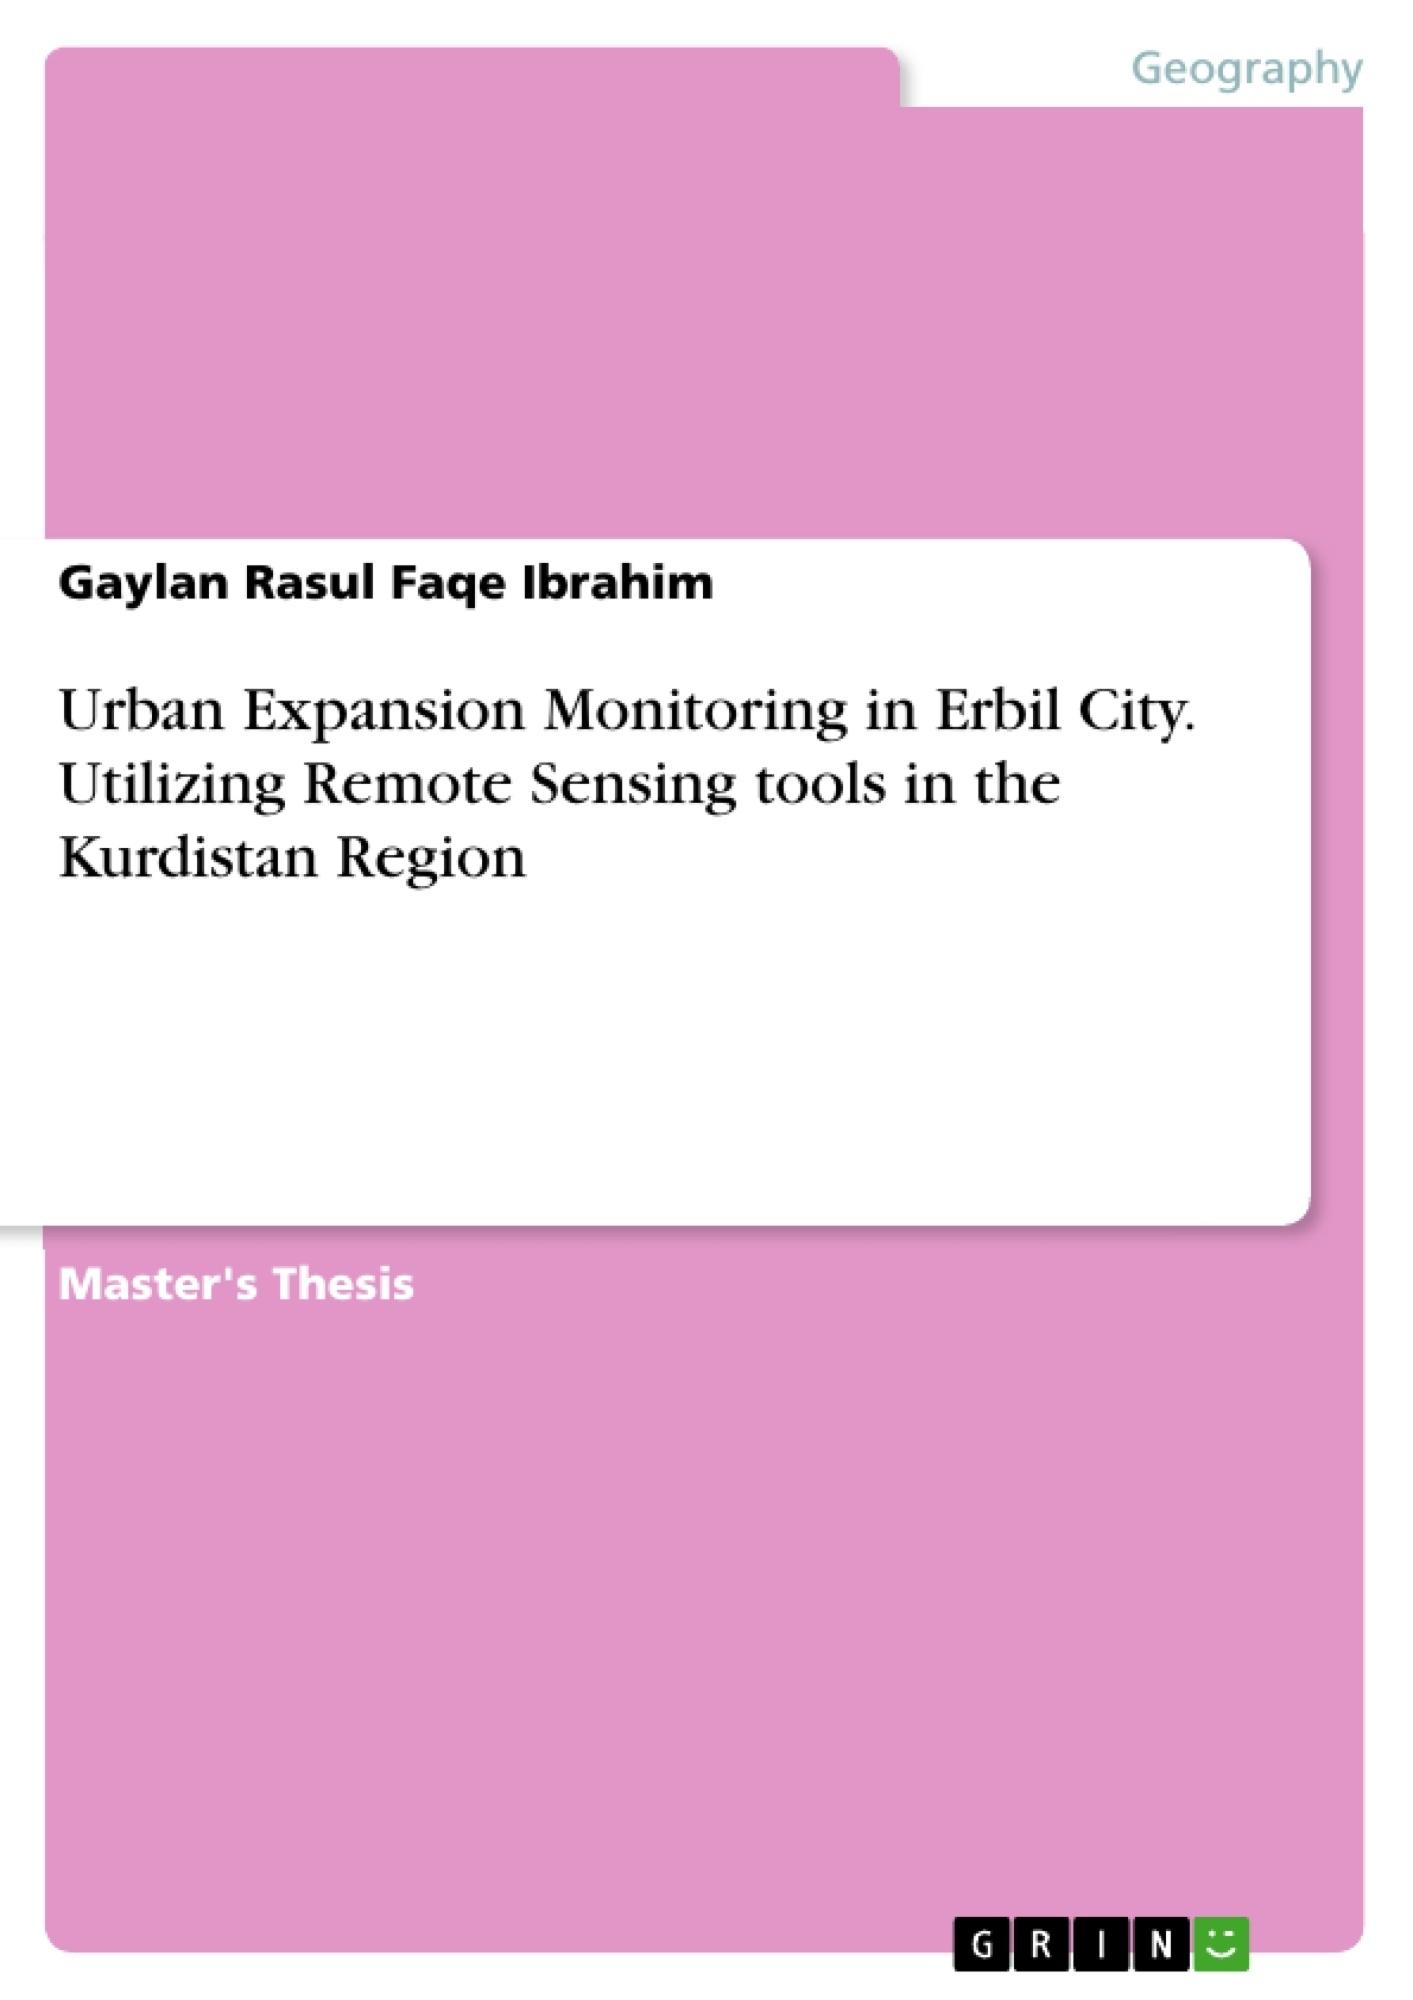 Title: Urban Expansion Monitoring in Erbil City. Utilizing Remote Sensing tools  in the Kurdistan Region